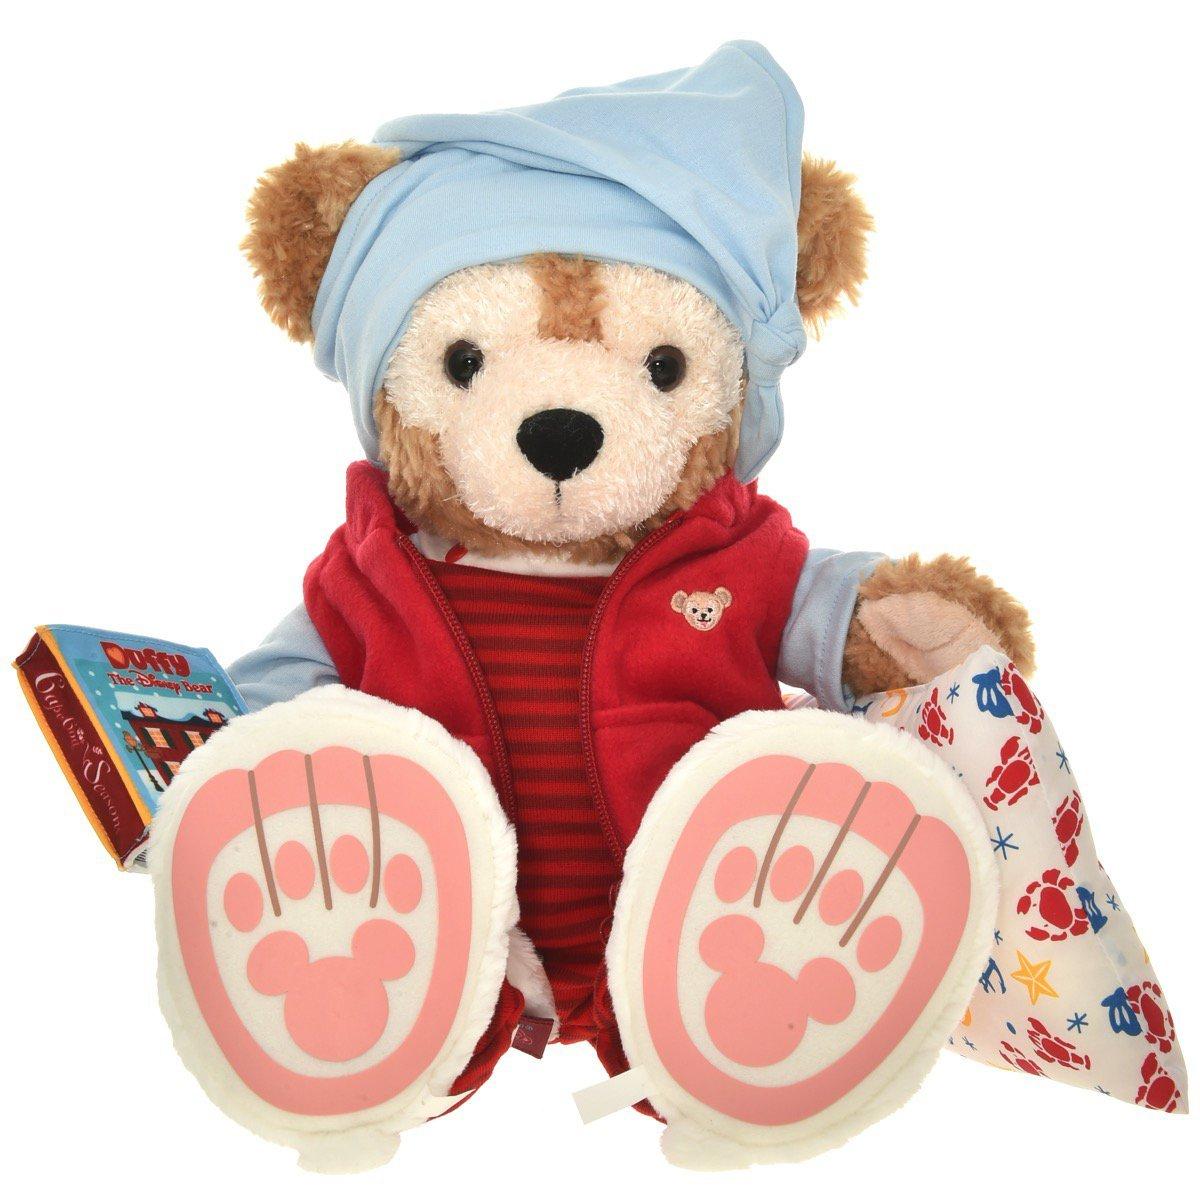 "NEW Disney Duffy bear 10th Anniversary Pajamas costume SET S 17"" Good night TDS"